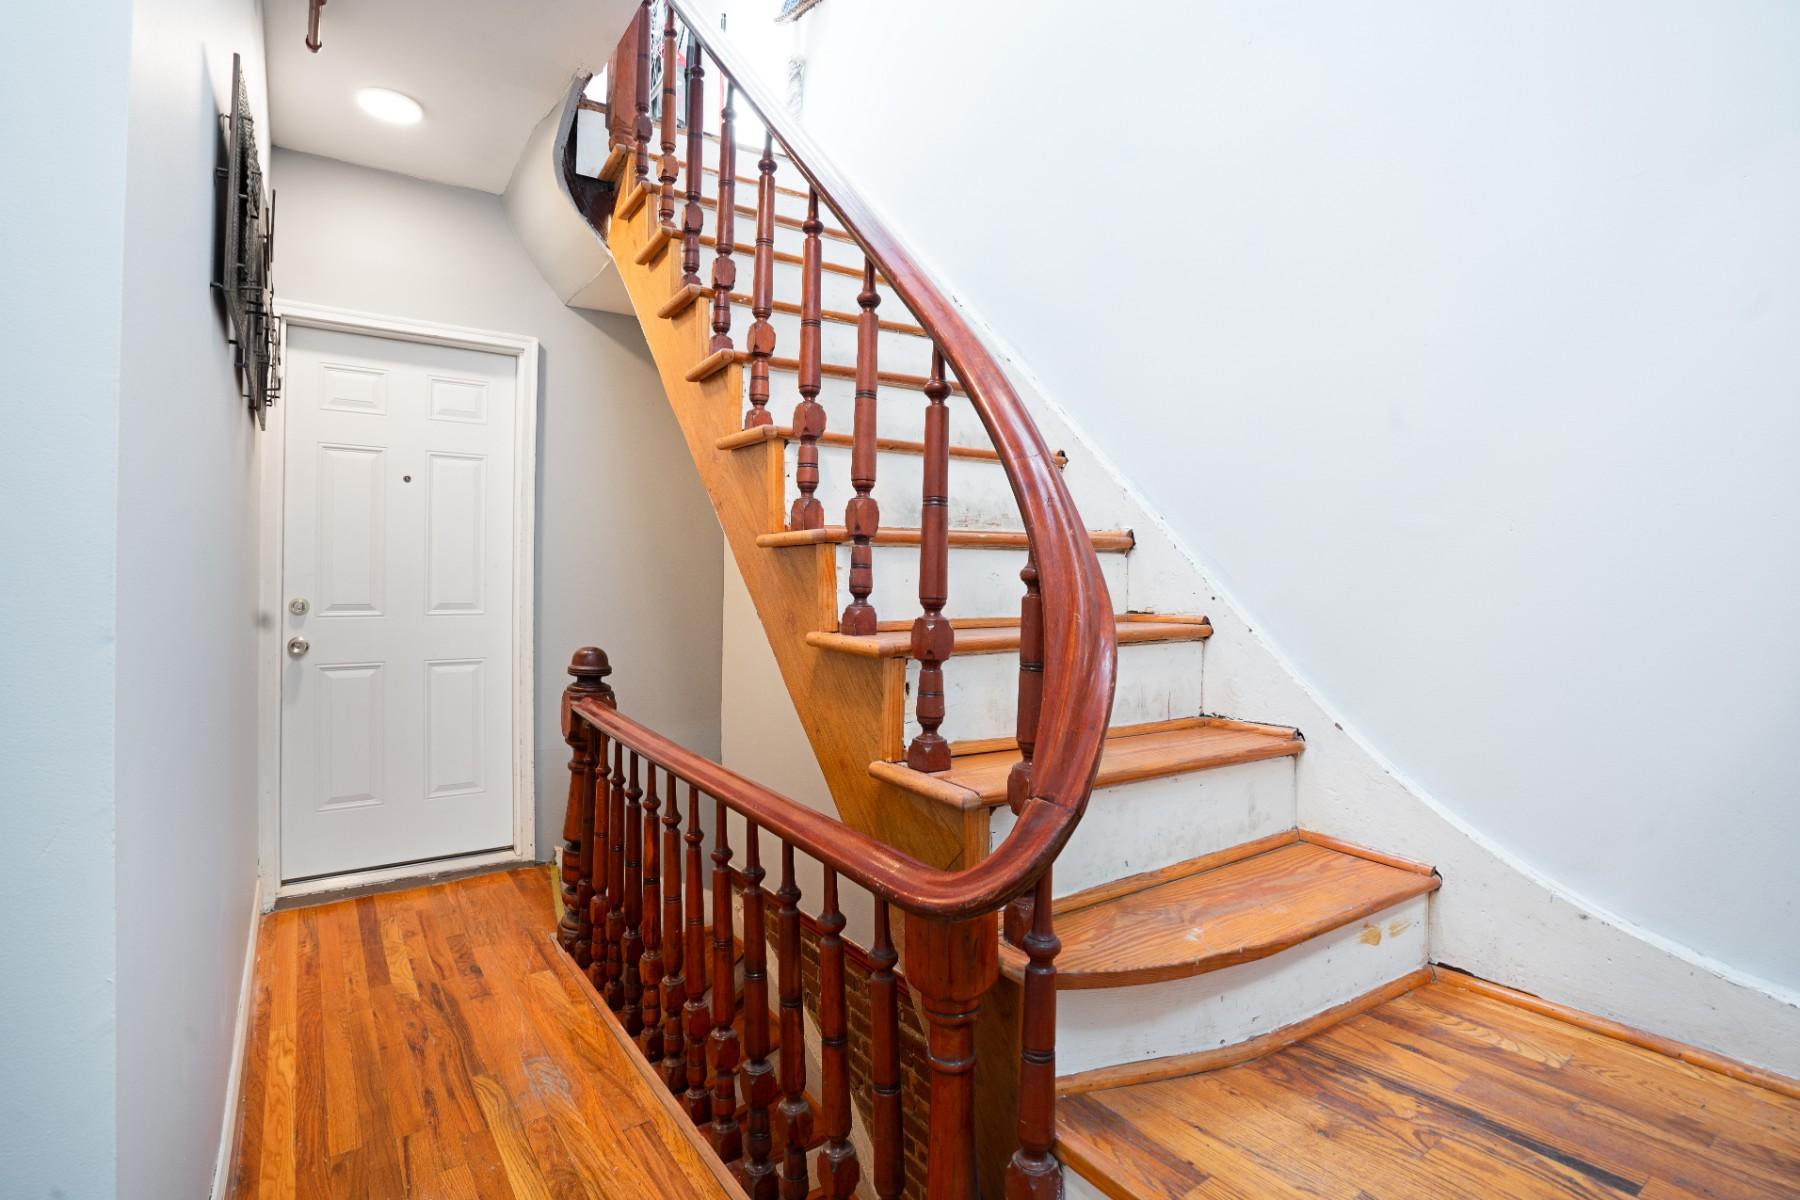 347 Quincy Street Bedford Stuyvesant Brooklyn NY 11216